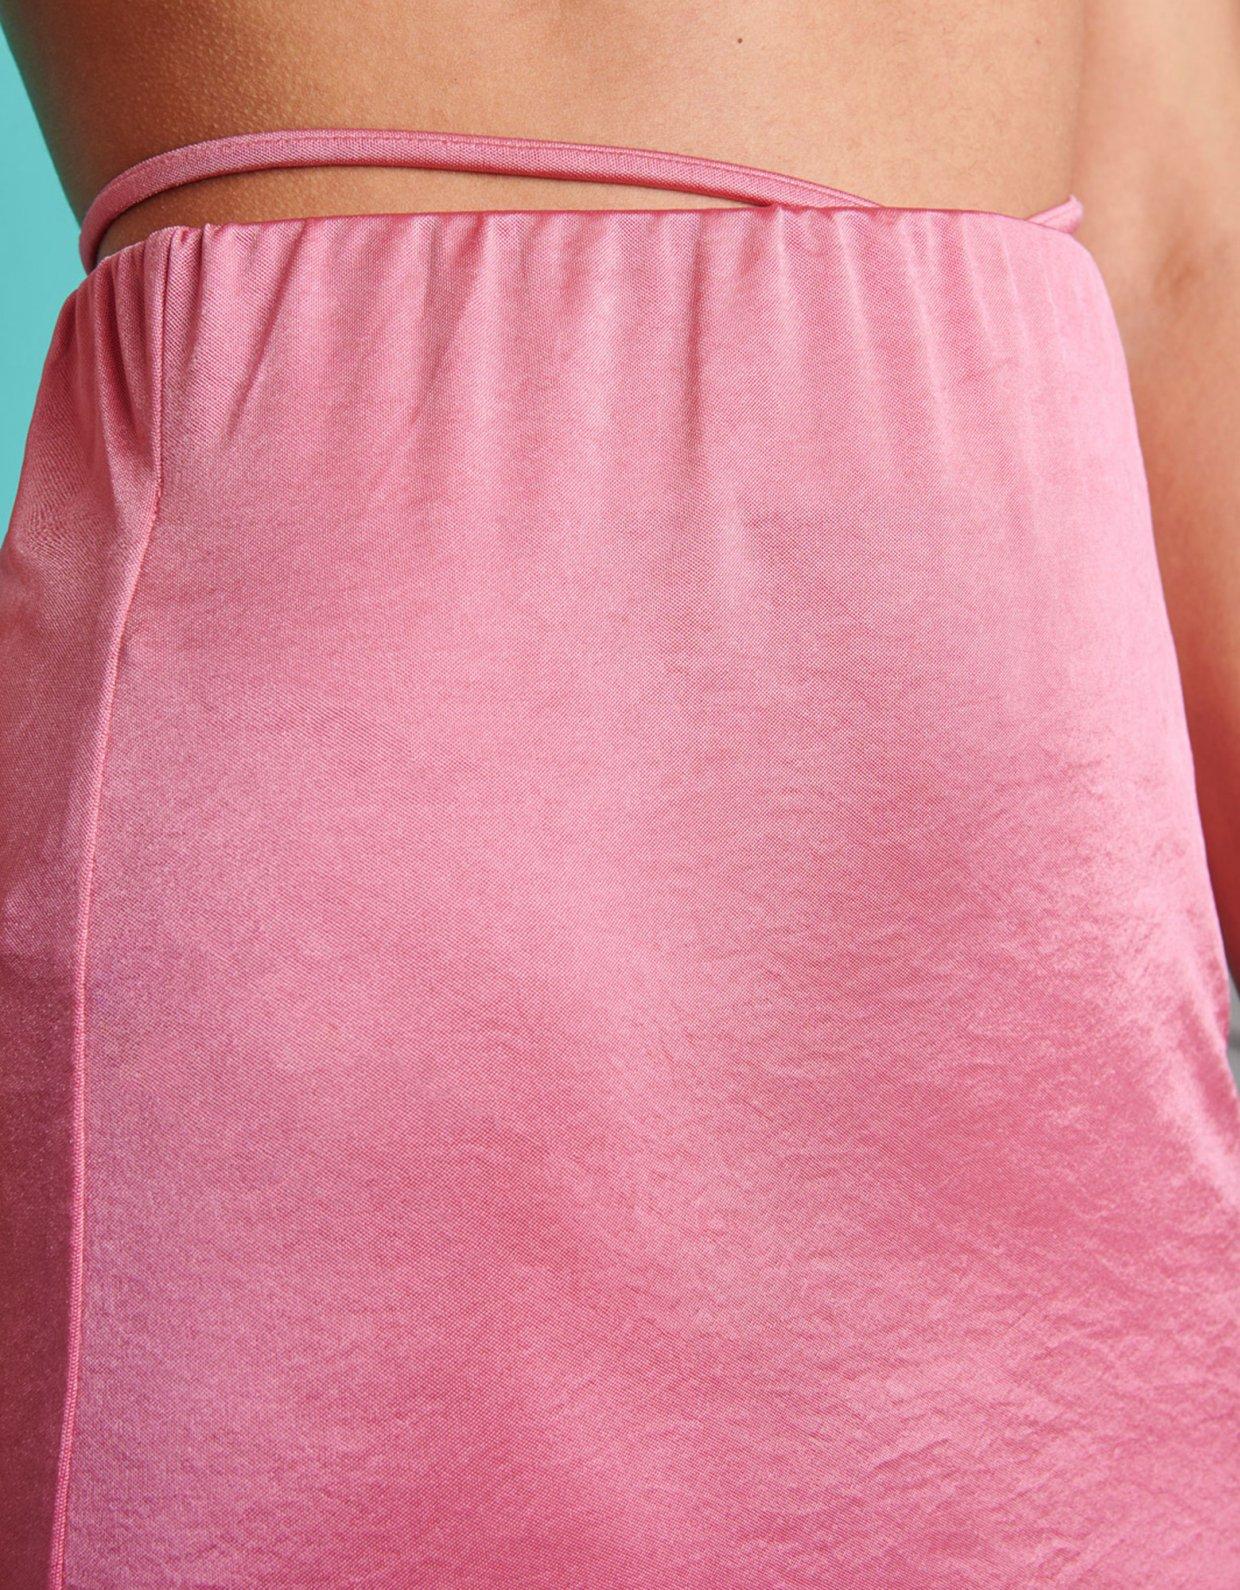 Sunset go July skirt pink